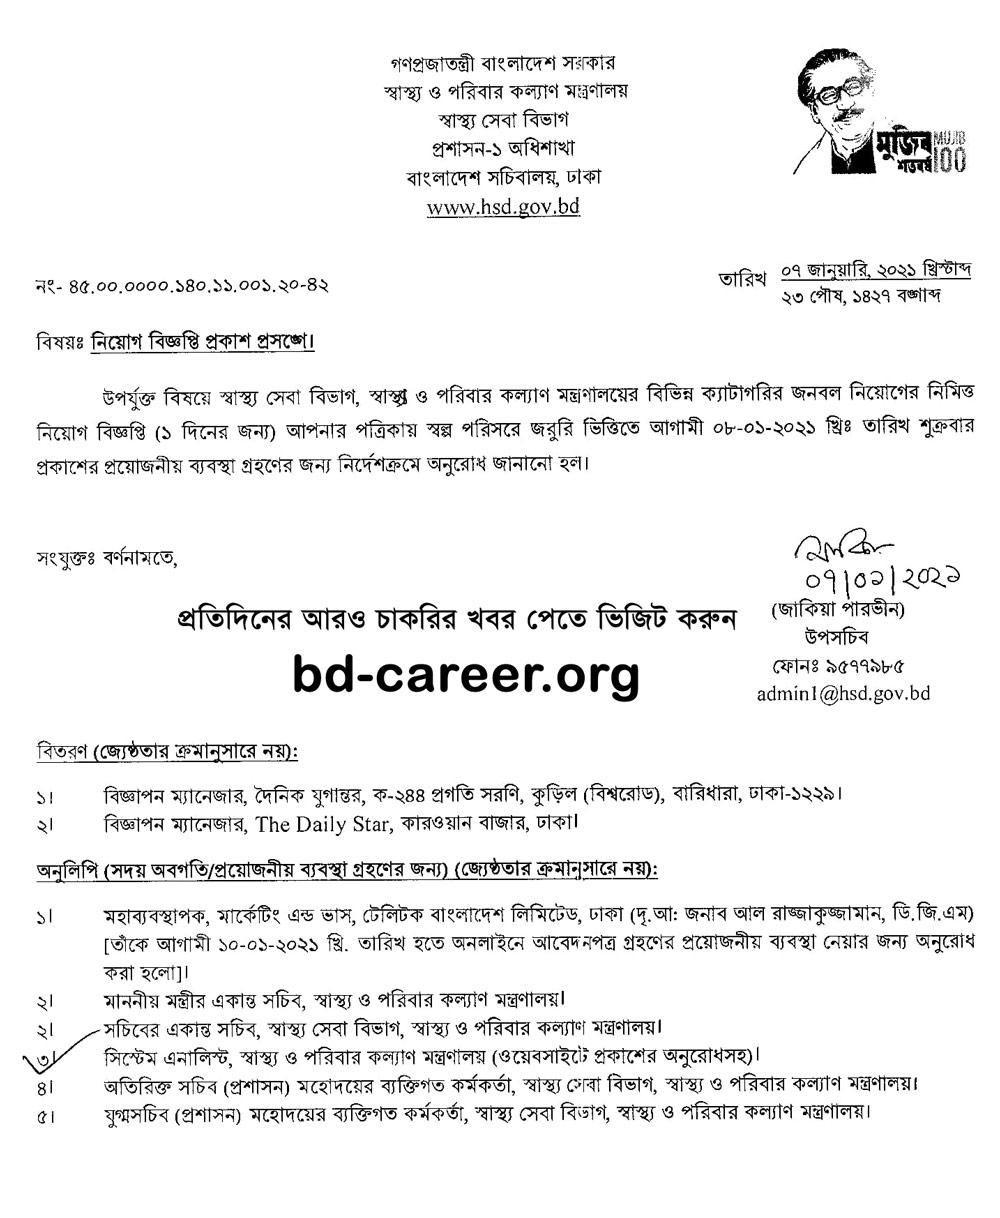 HSD Recruitment Notice 2021 PDF